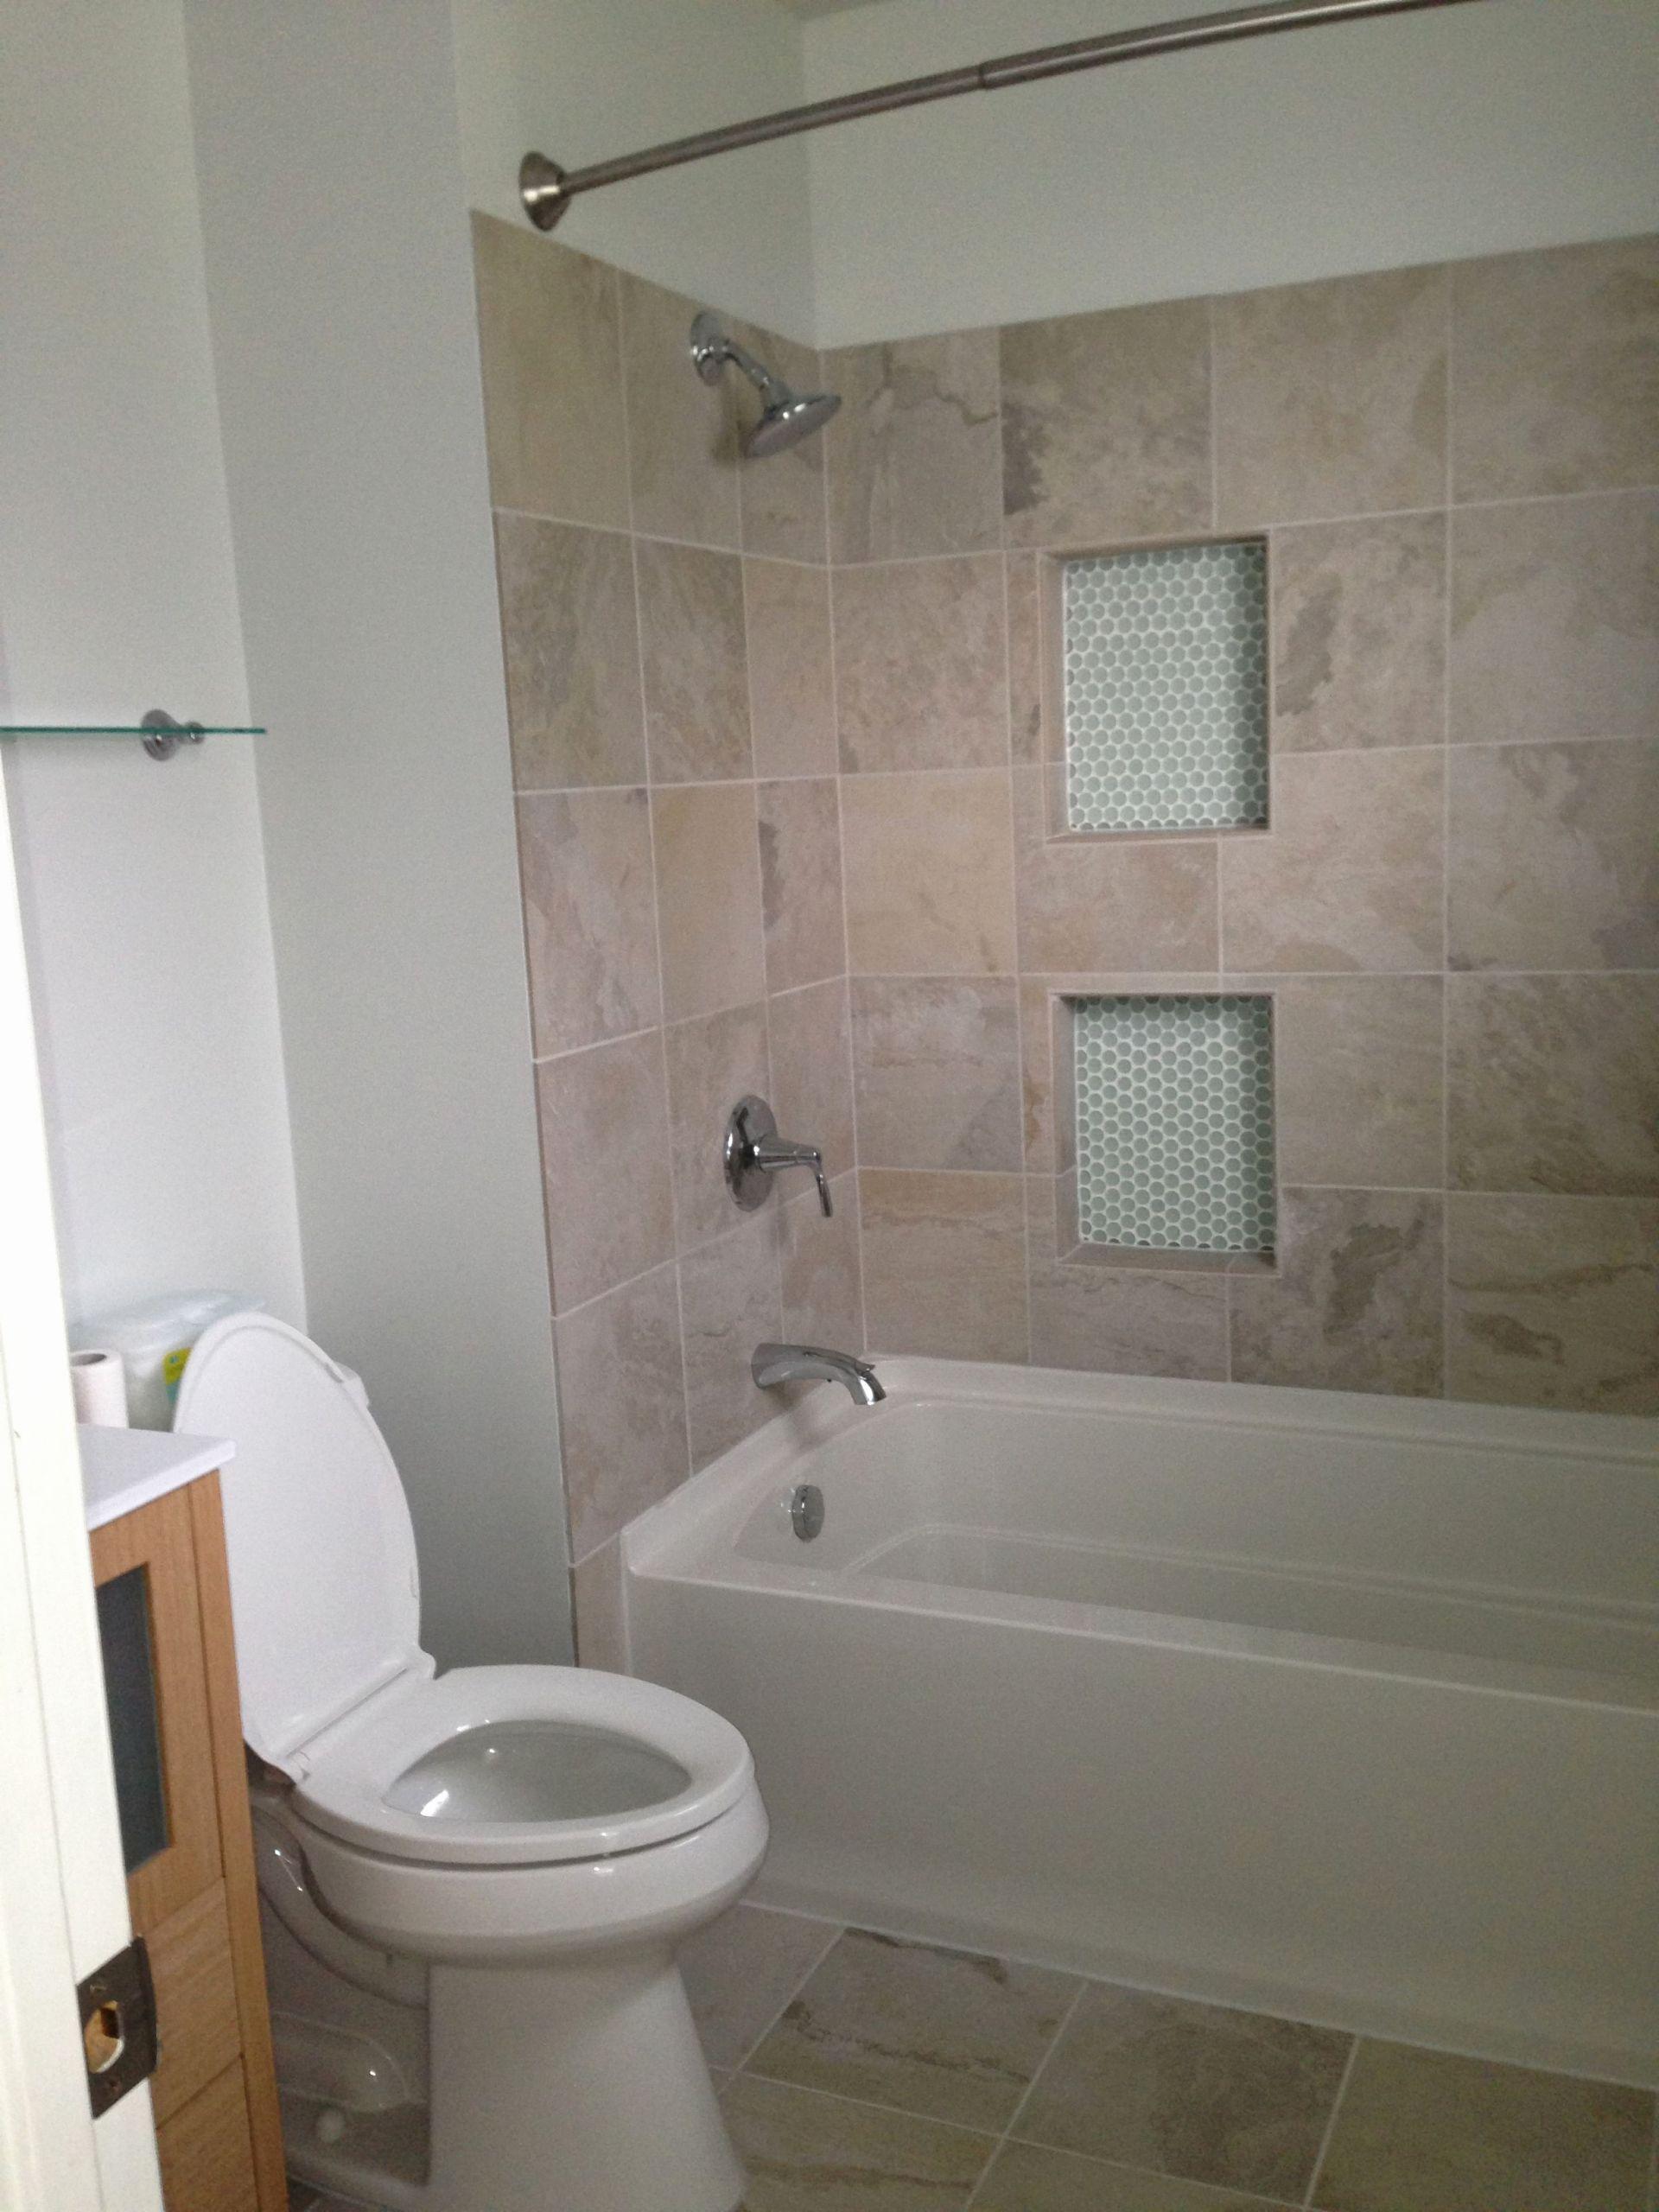 Home Depot Bathroom Tiles Ideas Best Of My Bathroom ...